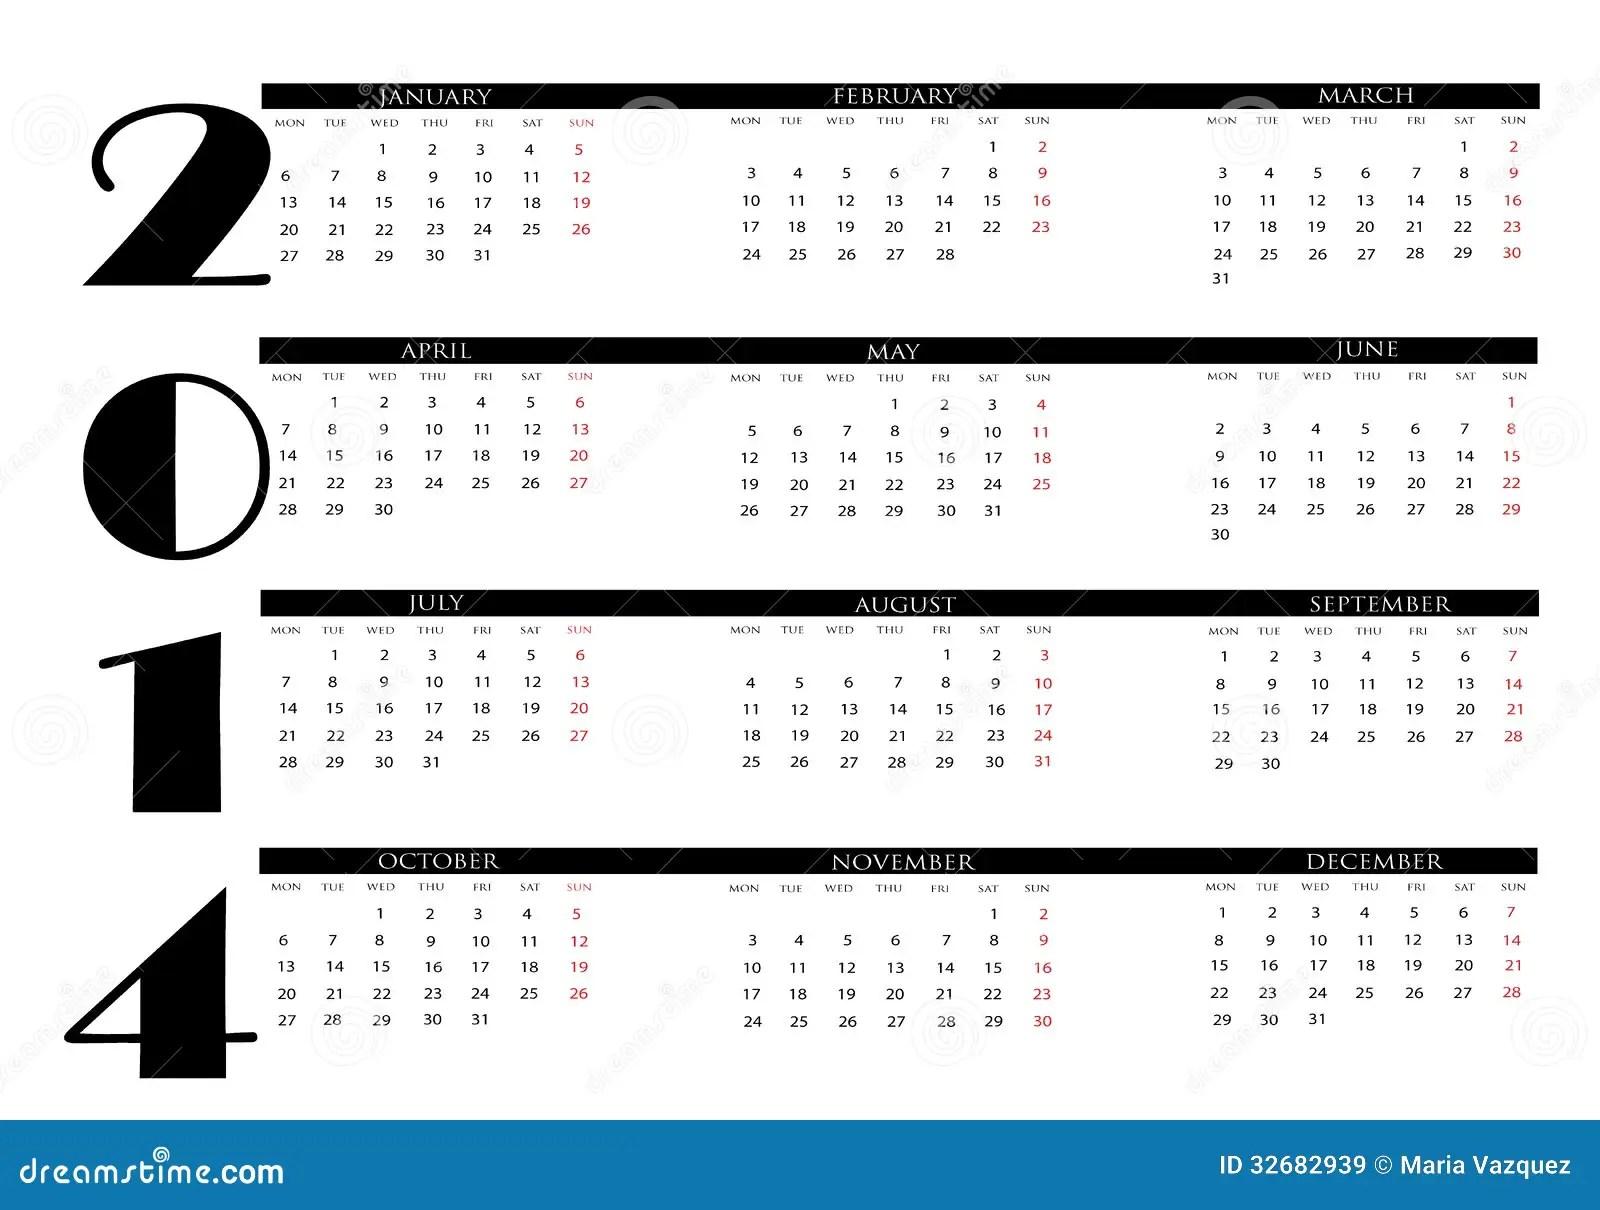 Calendar 2014 stock vector. Illustration of business